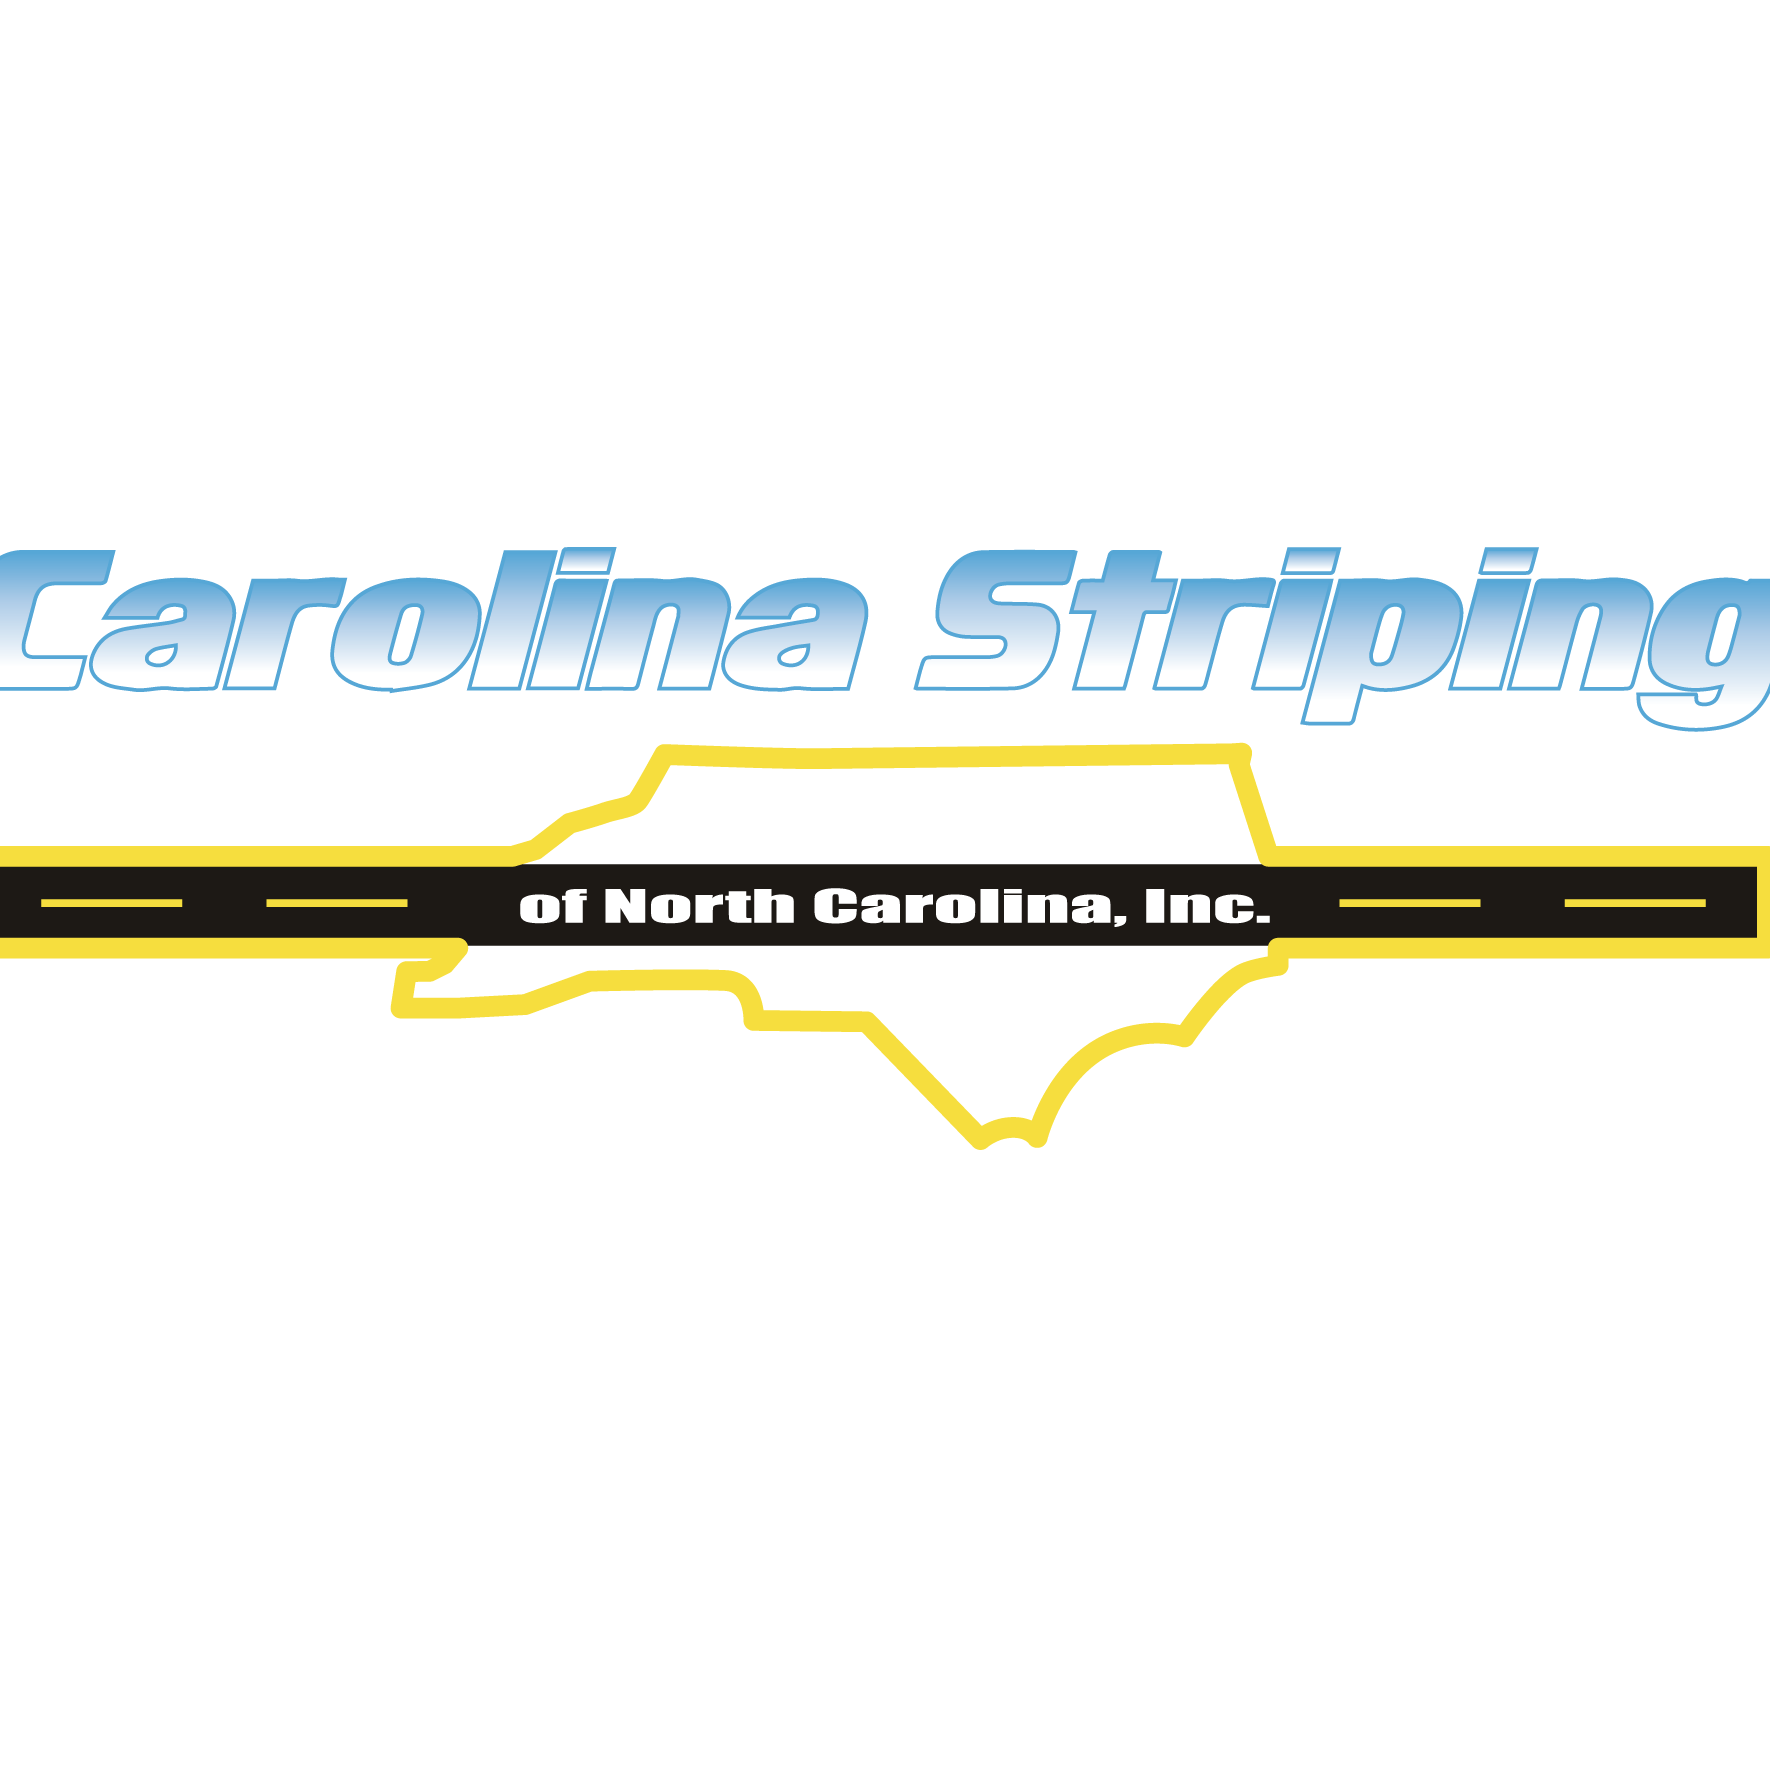 Carolina Striping Logo